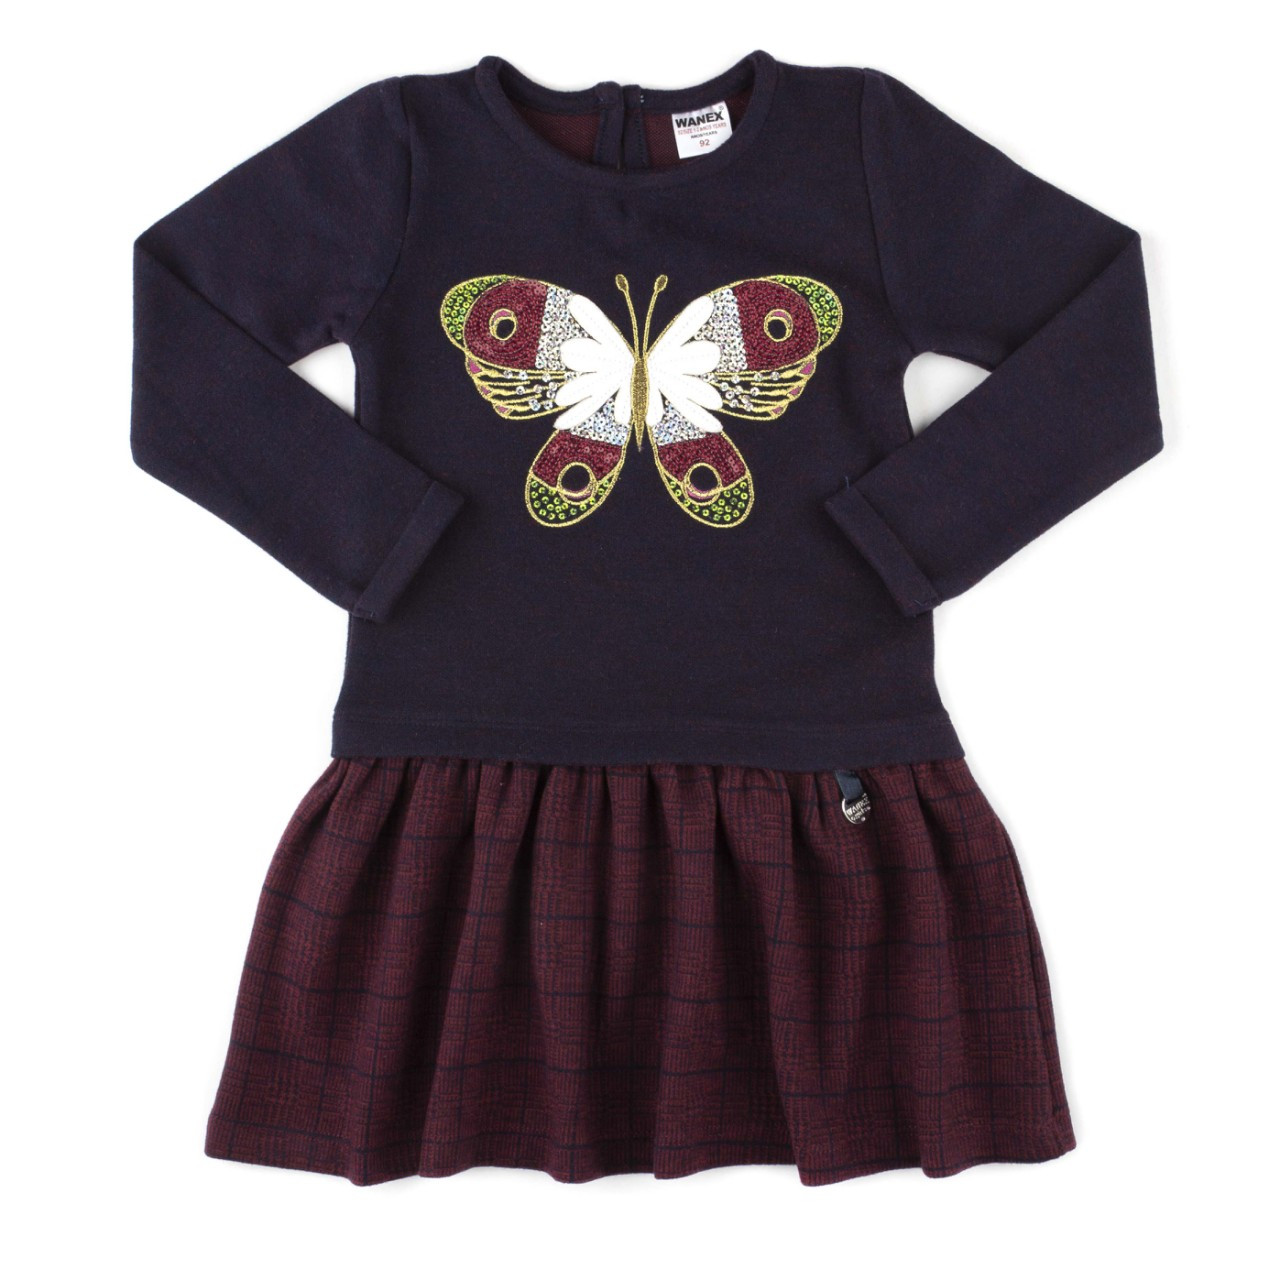 460ef1febf1 Платье WANEX с бабочкой 92 98 104 116 122 - Polyanka в